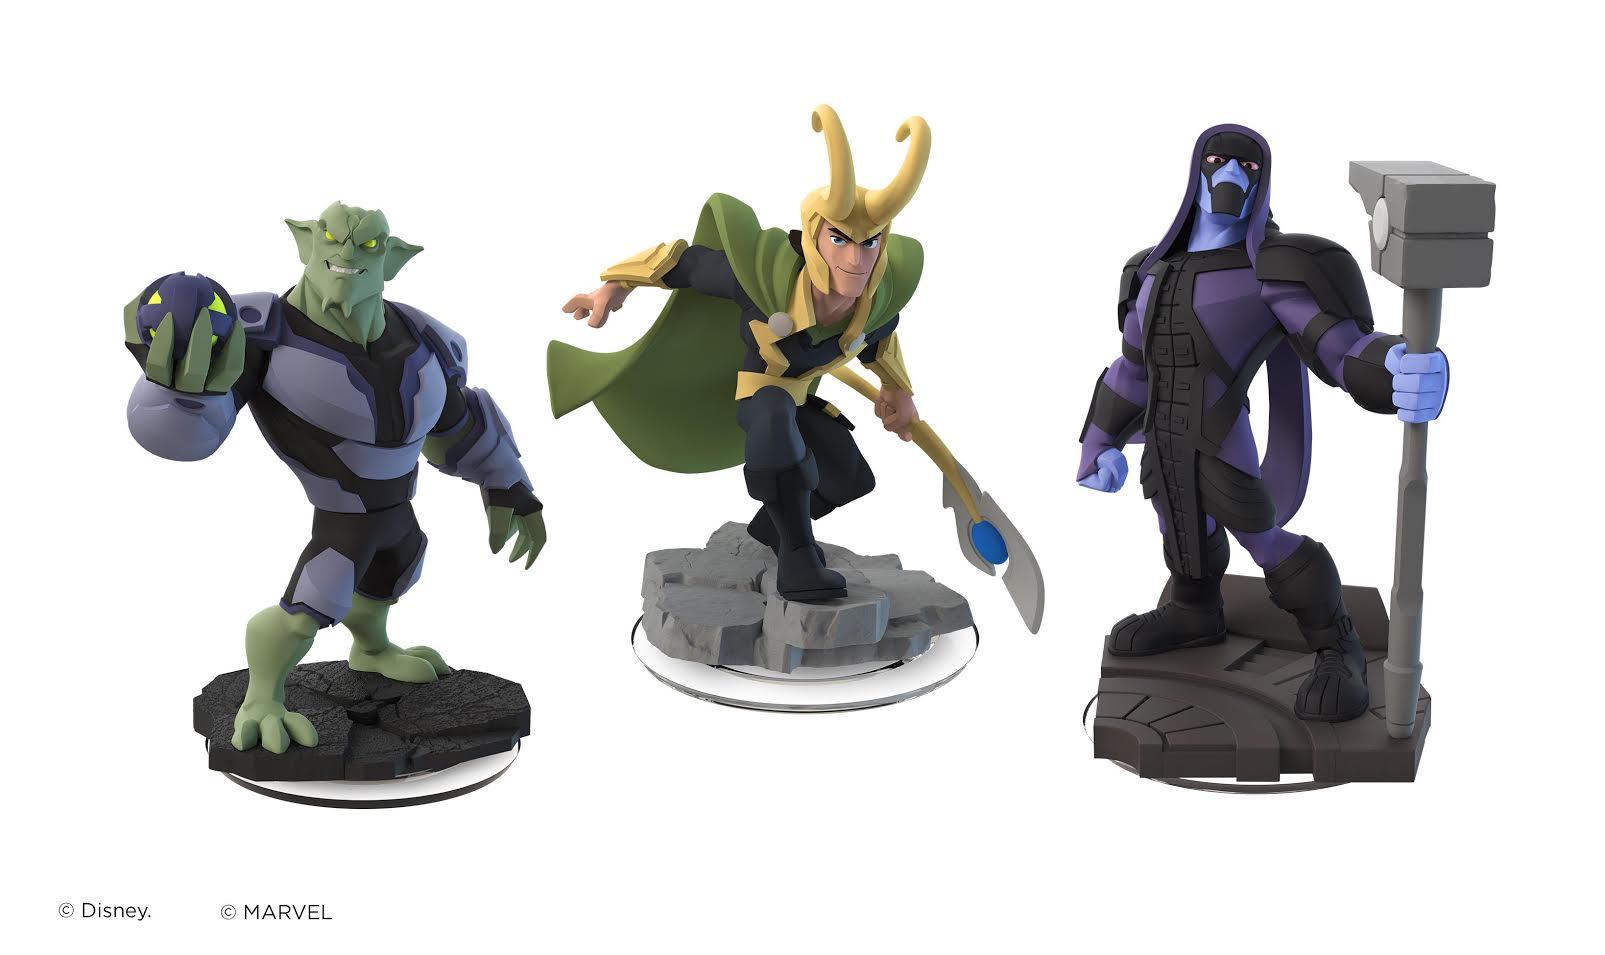 Loki, Green Goblin, and Ronan invade Disney Infinity 2.0